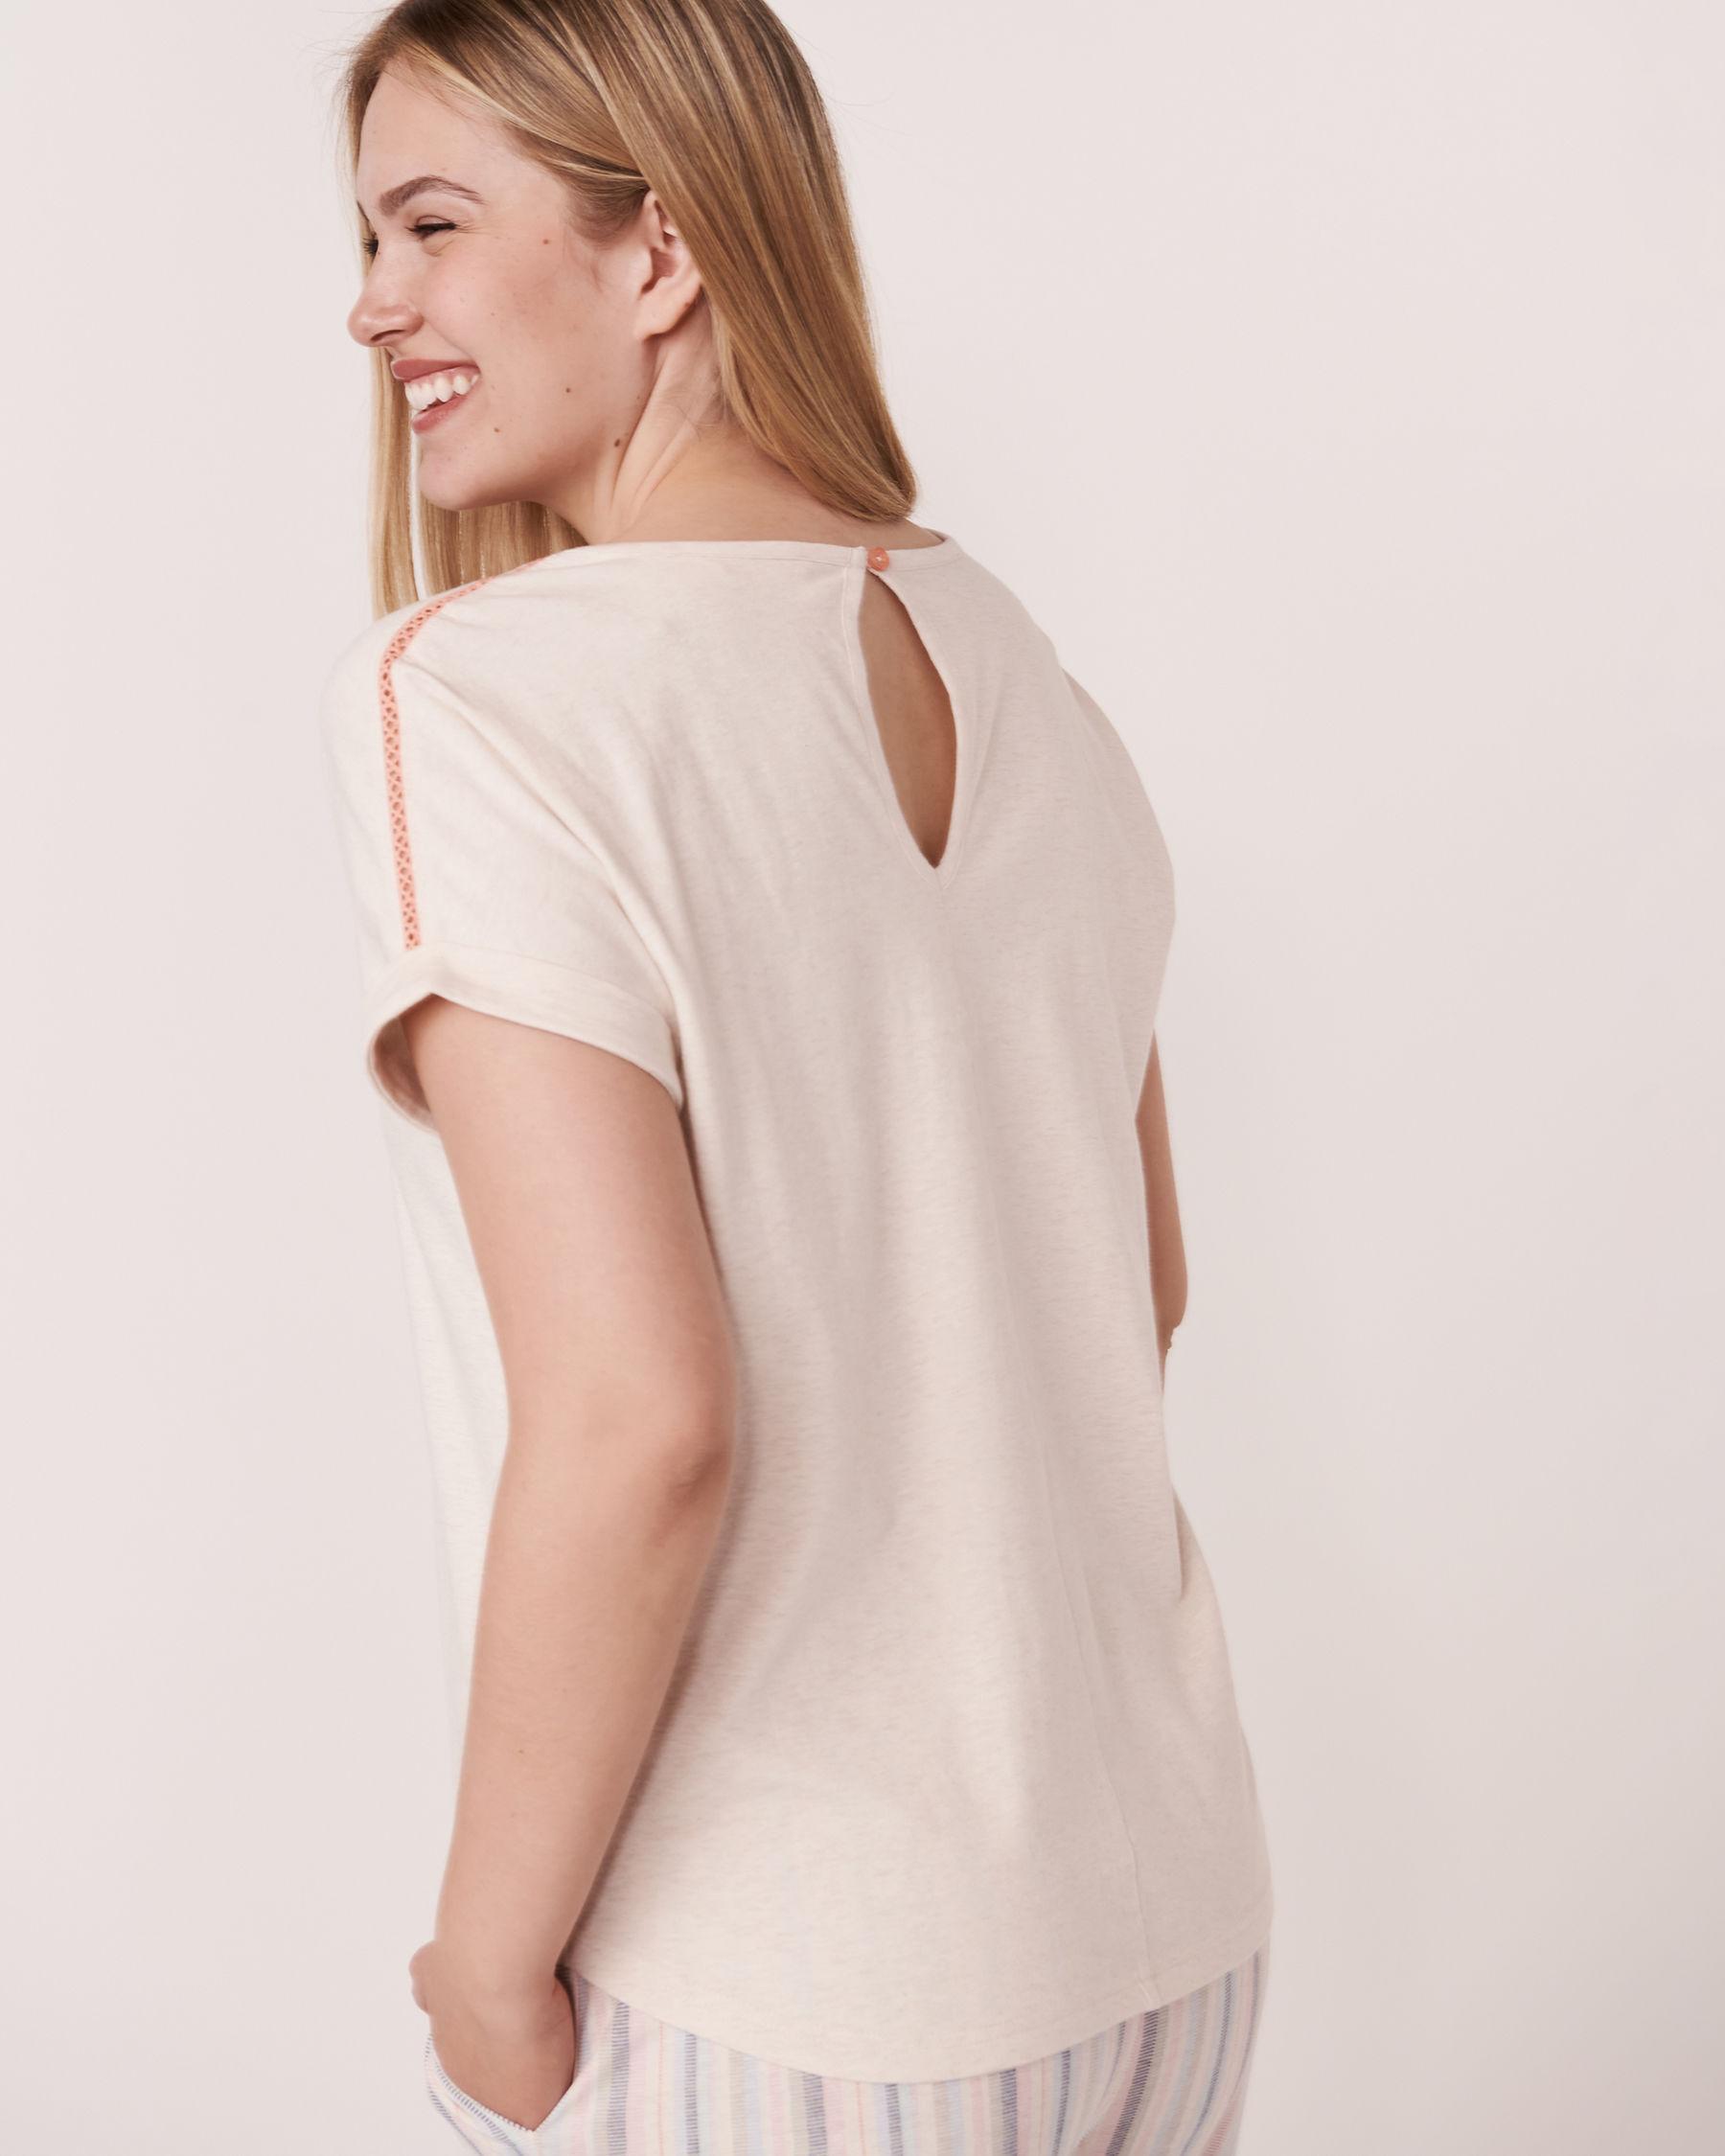 LA VIE EN ROSE Organic Cotton V-neck T-shirt Grey mix 40100048 - View2